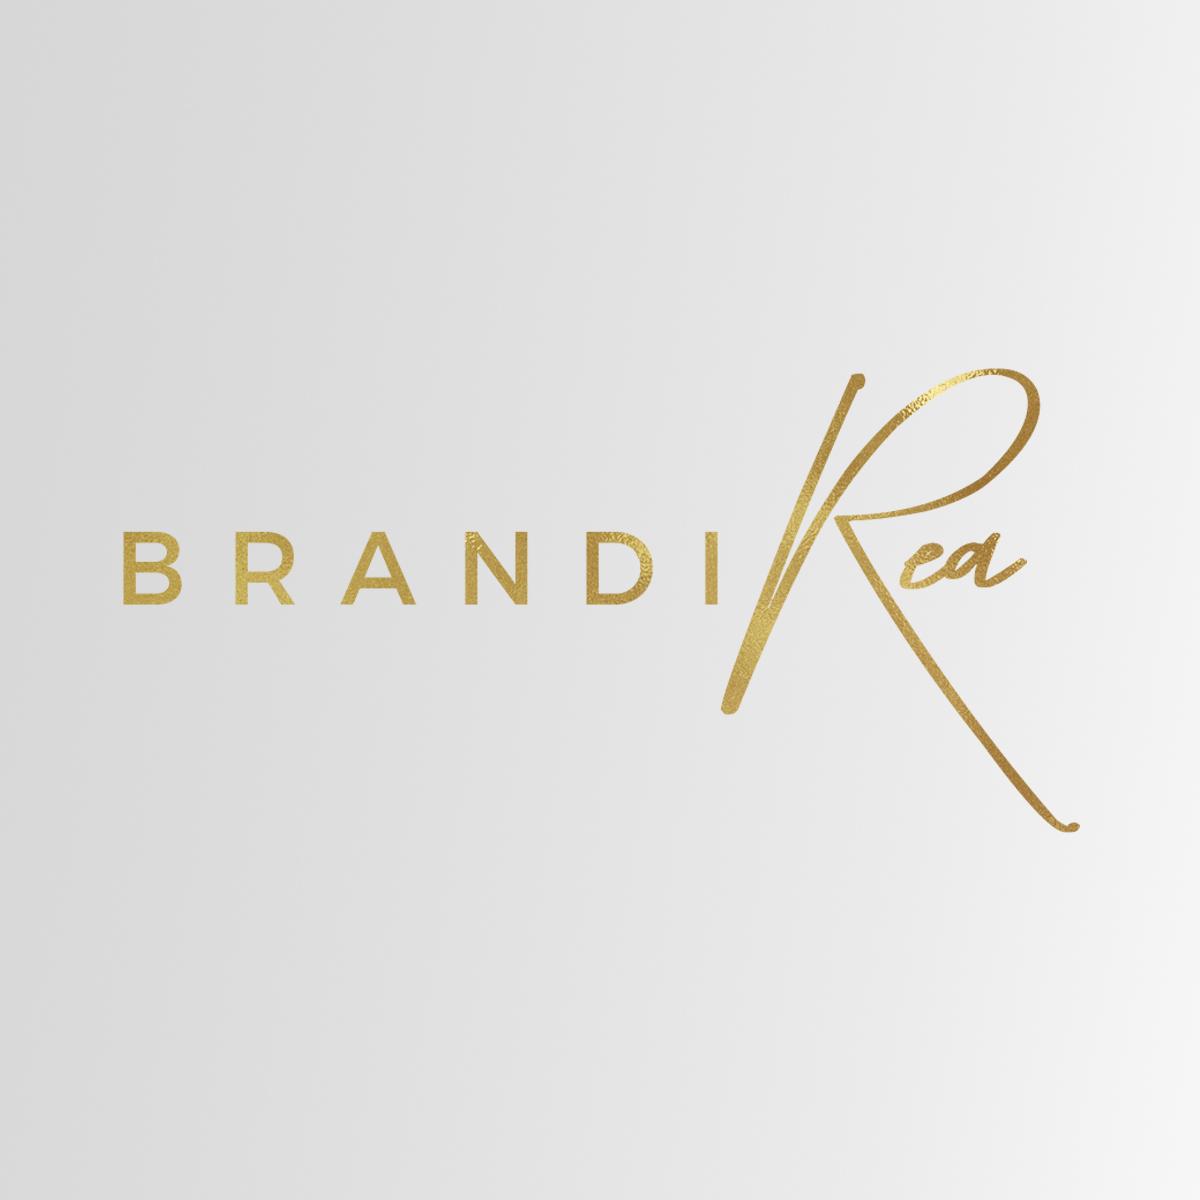 branding - creative - agency - logo design - community -marketing - web design - social media - brandi rea - health blog - fitness blog - blog design - blog brand